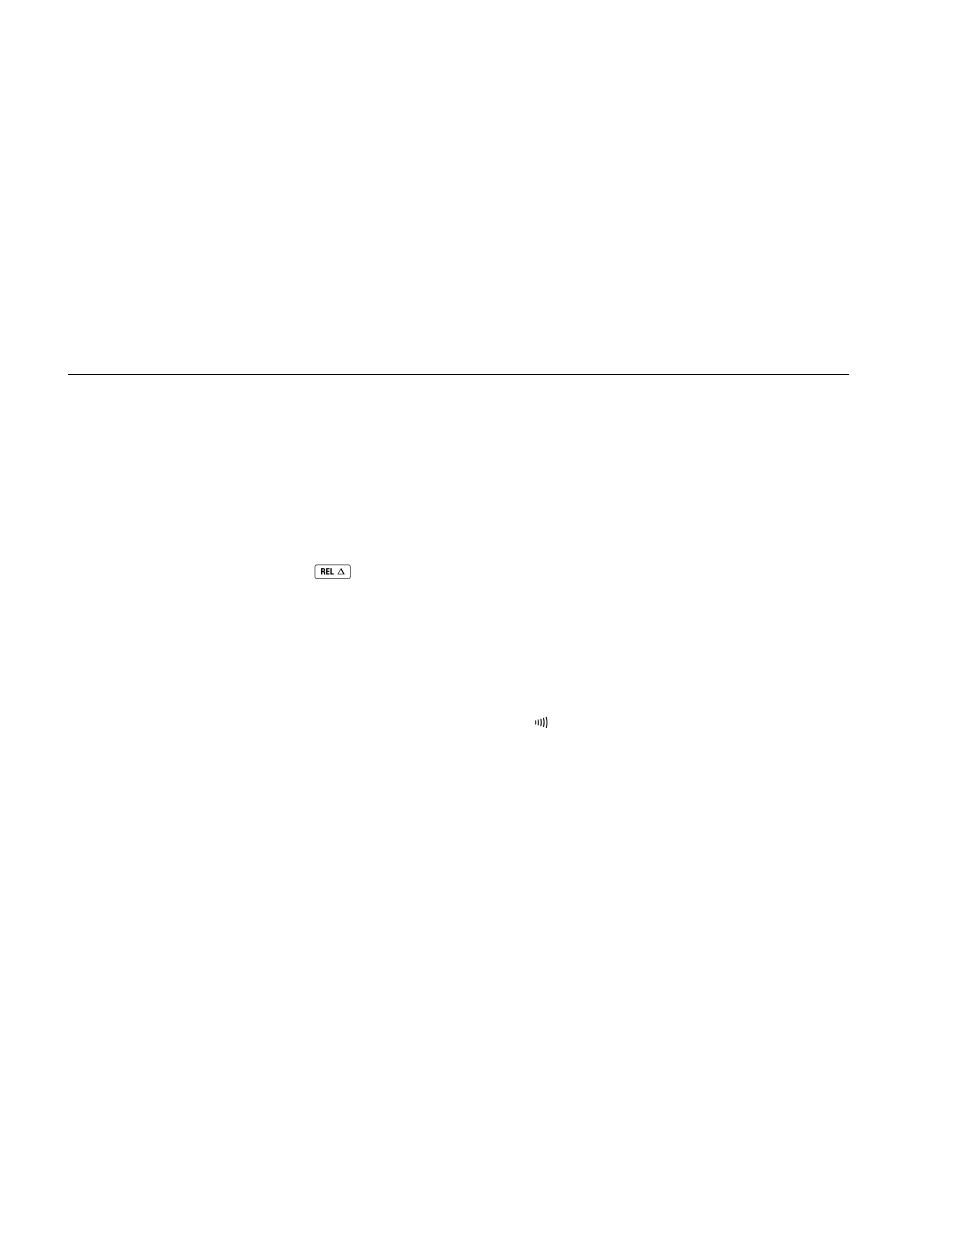 testing for continuity fluke 189 user manual page 44   96 fluke 45 dual display multimeter user manual fluke ti 45 user manual